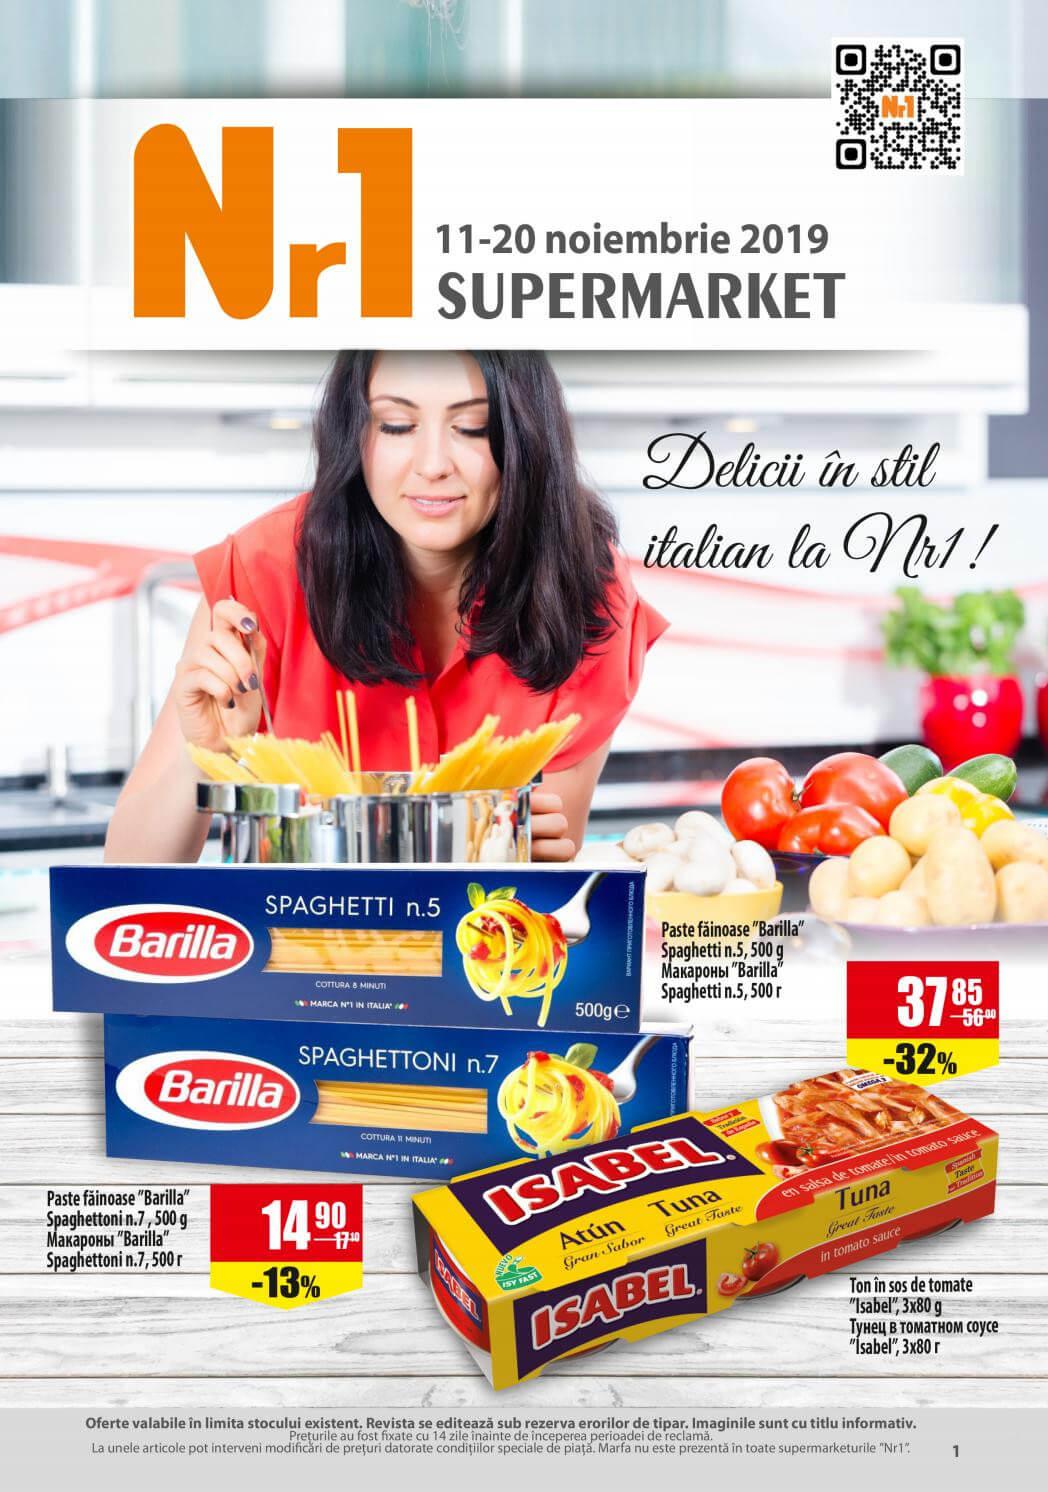 NR1 - Delicii în stil italian